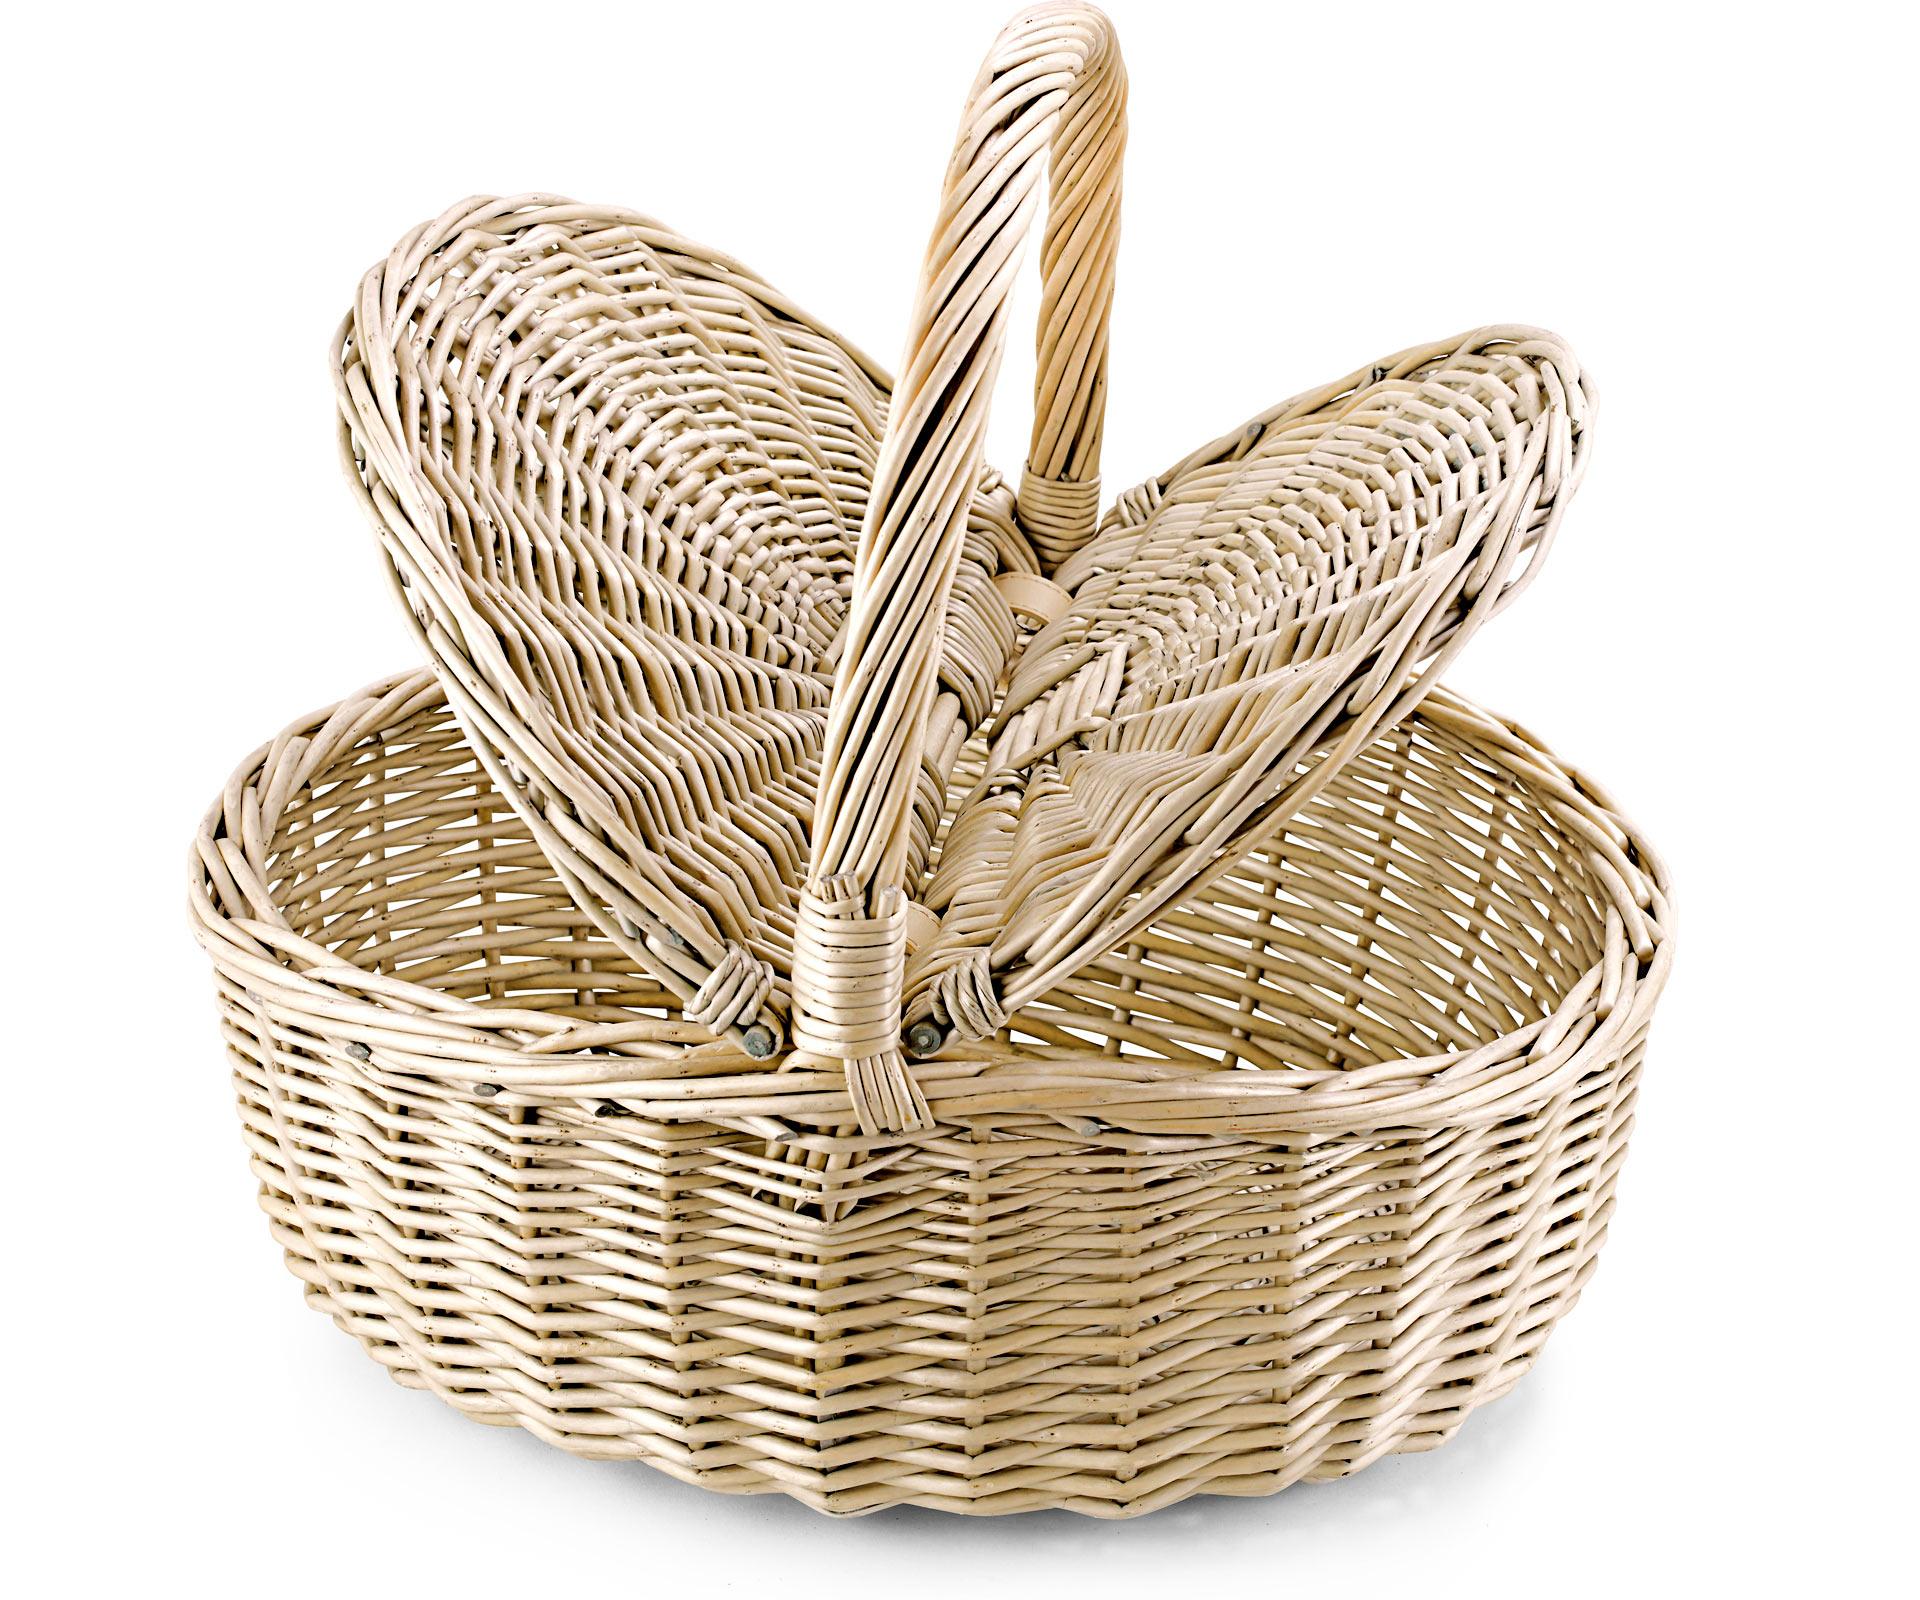 Picnic Basket Empty : Empty picnic basket twin hamper style oval all